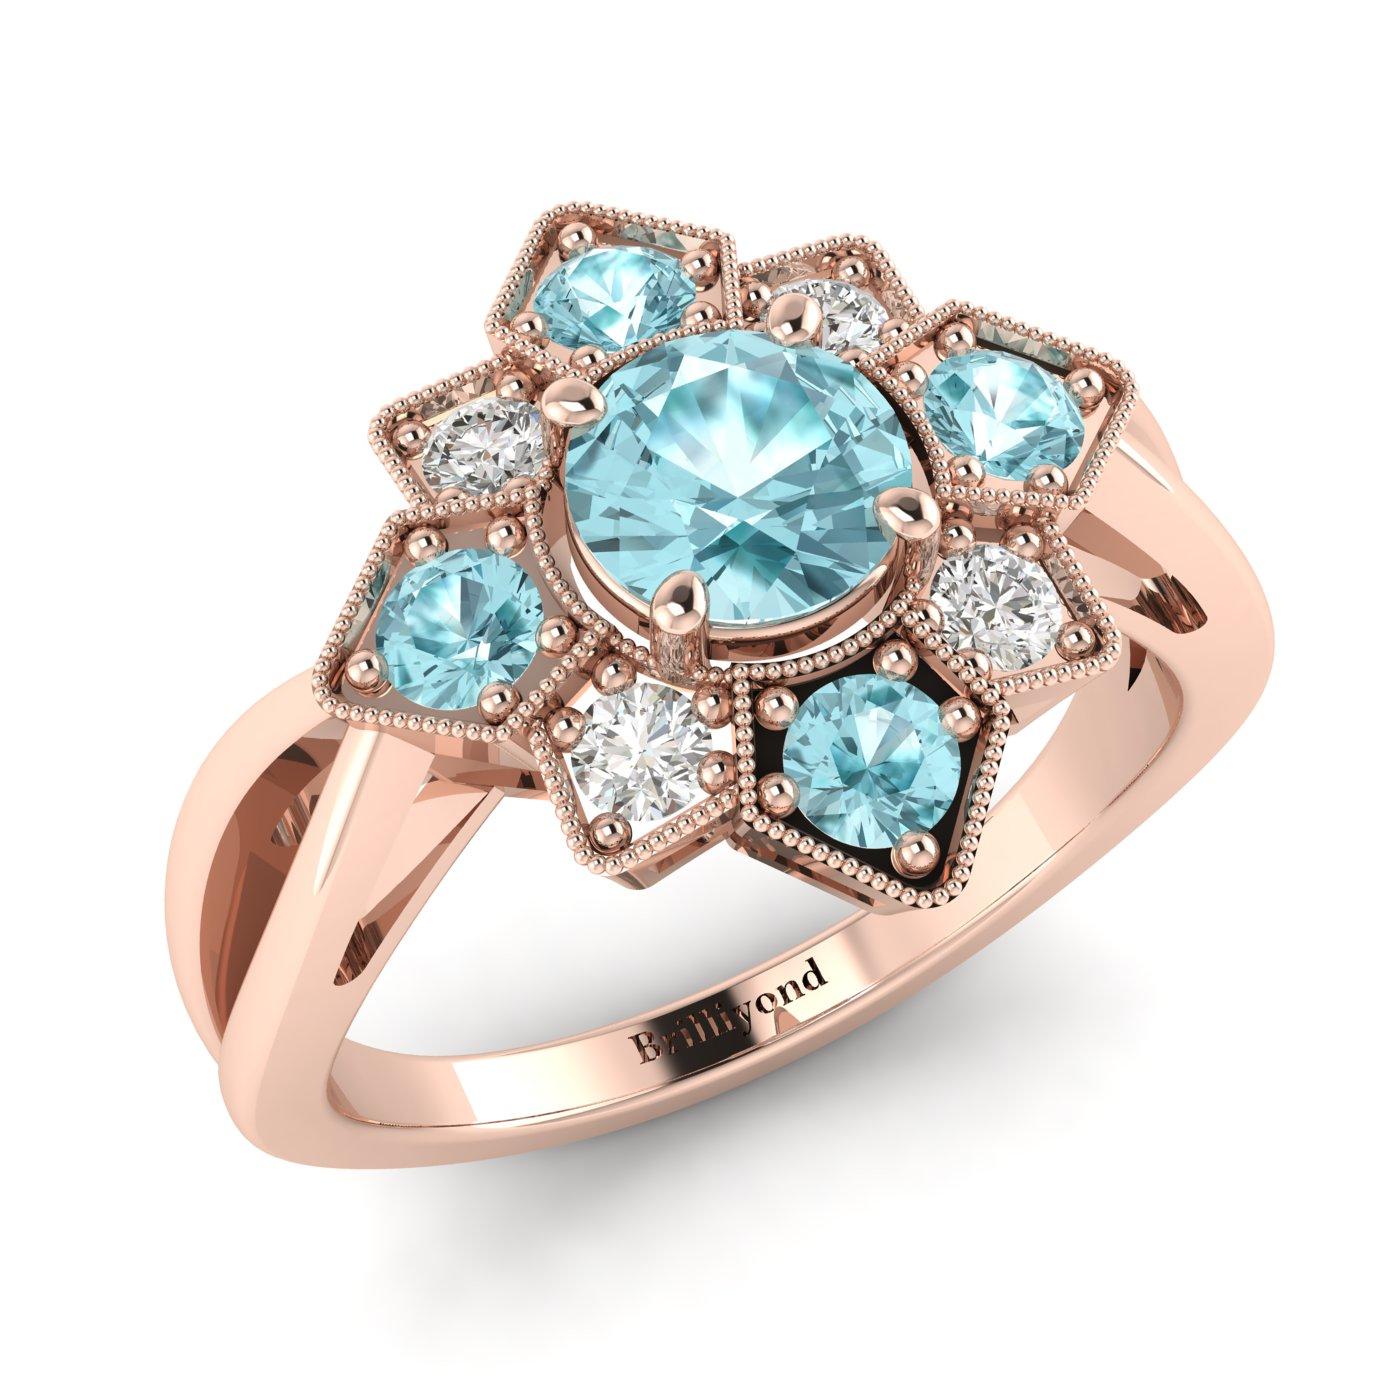 Aquamarine Rose Gold Cluster Engagement Ring Madonna_image1